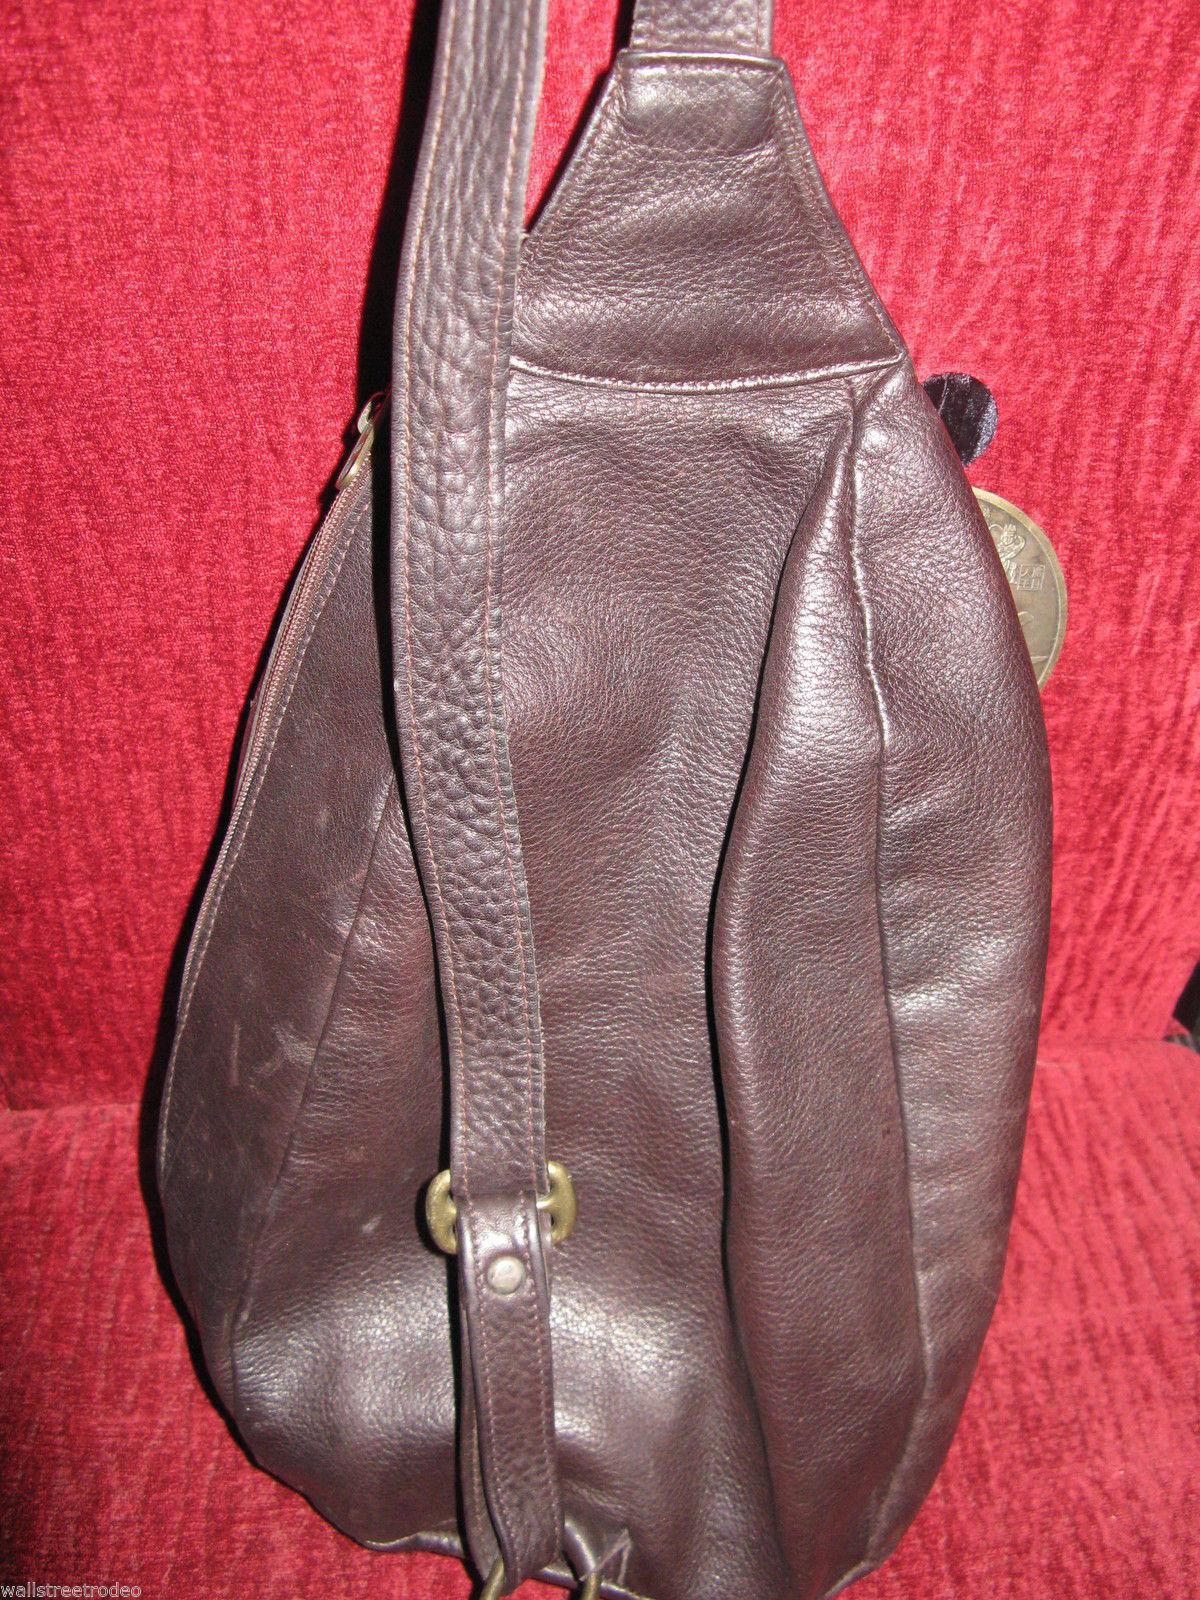 Ellington Portland  leather mini backpack rucksack sling tote handbag purse image 3